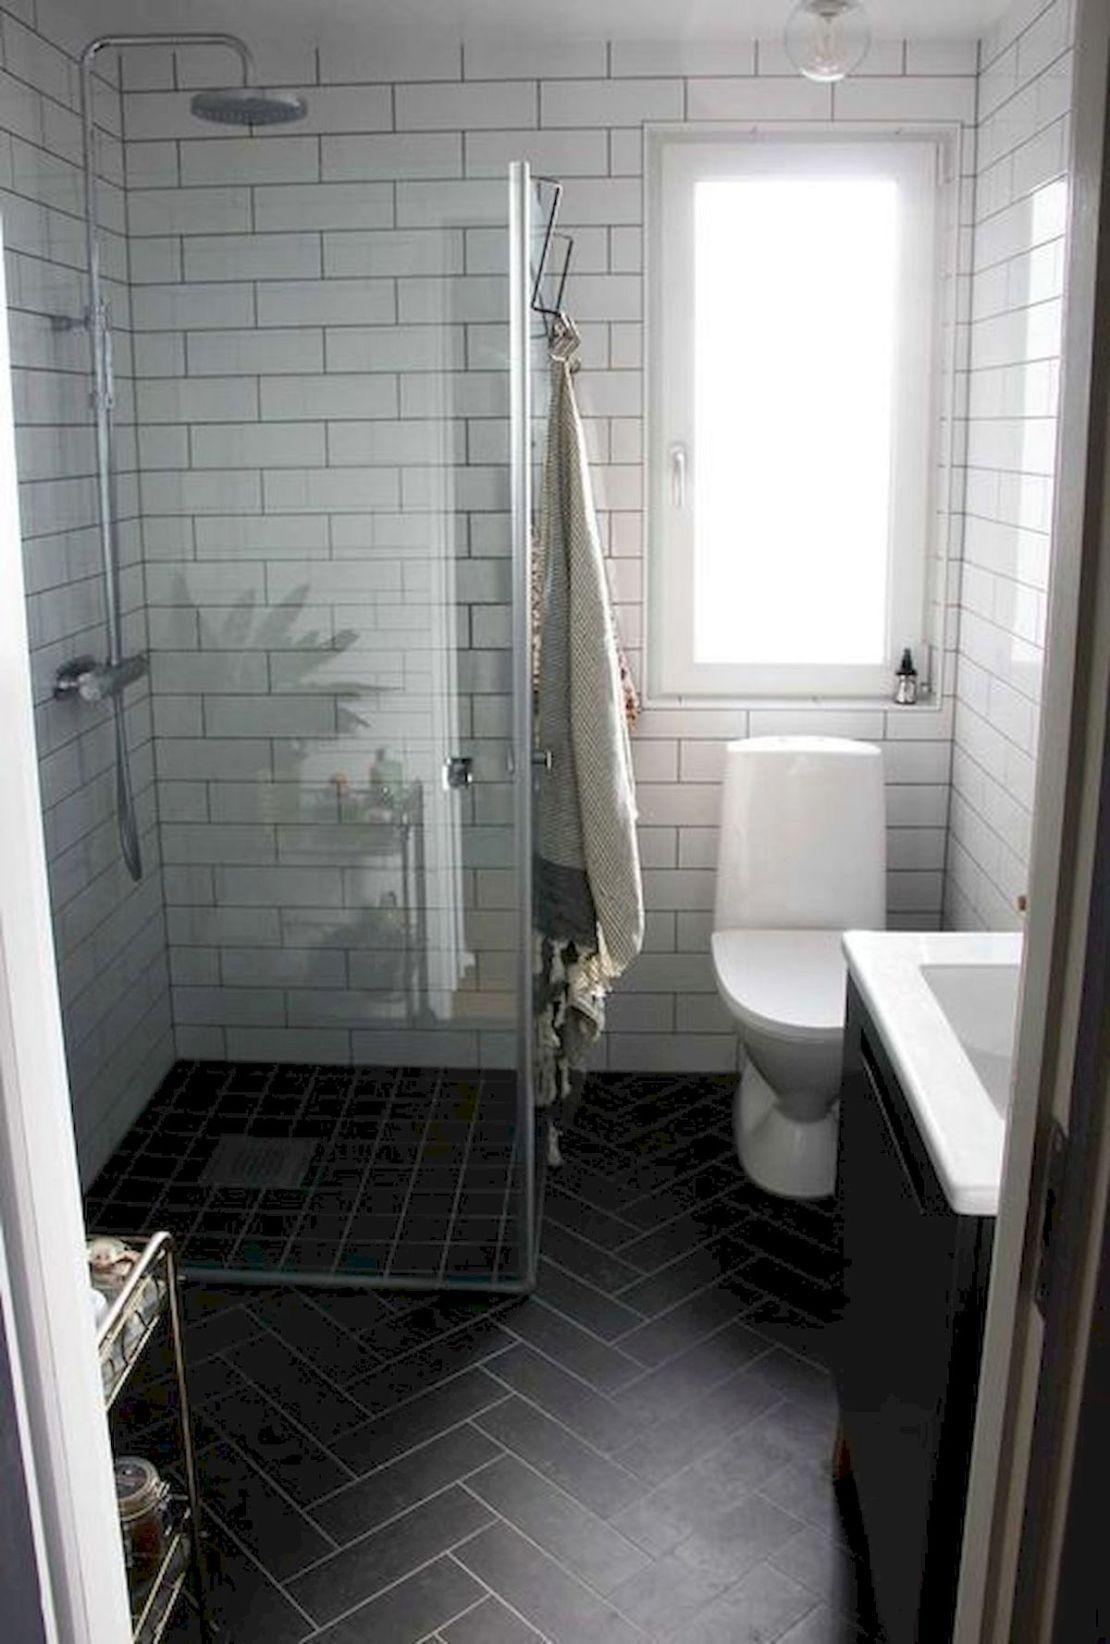 Stunning Small Bathroom Ideas On A Budget 20 Shairoom Com Simple Bathroom Small Master Bathroom Bathroom Design Small Decorating ideas bathroom flooring